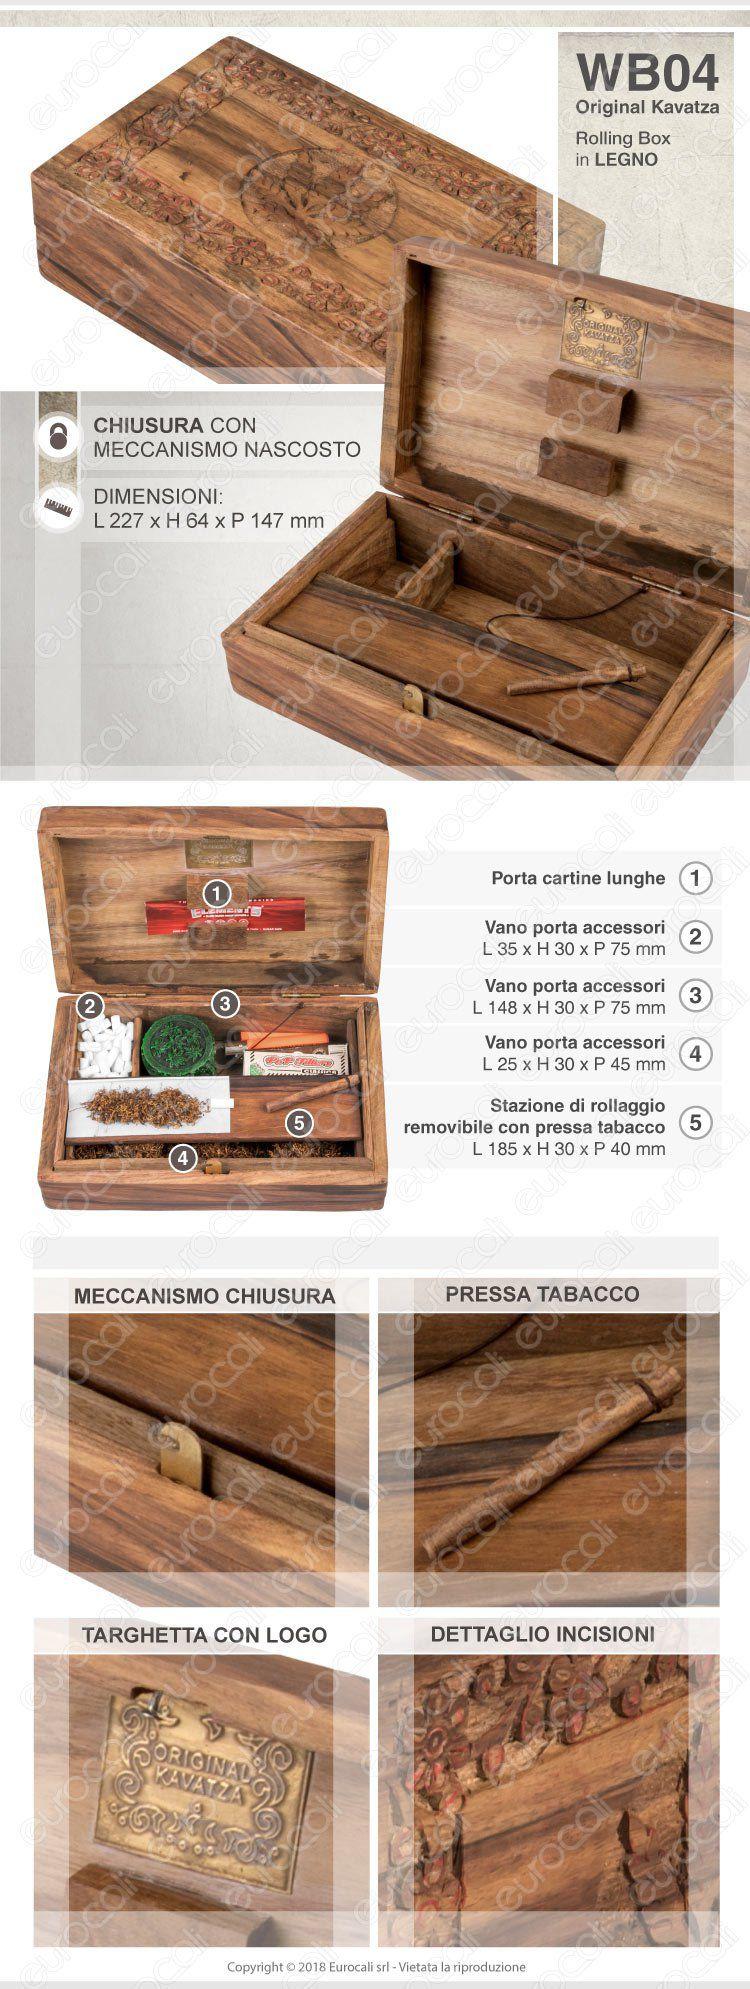 Holz Box Original Kavatza